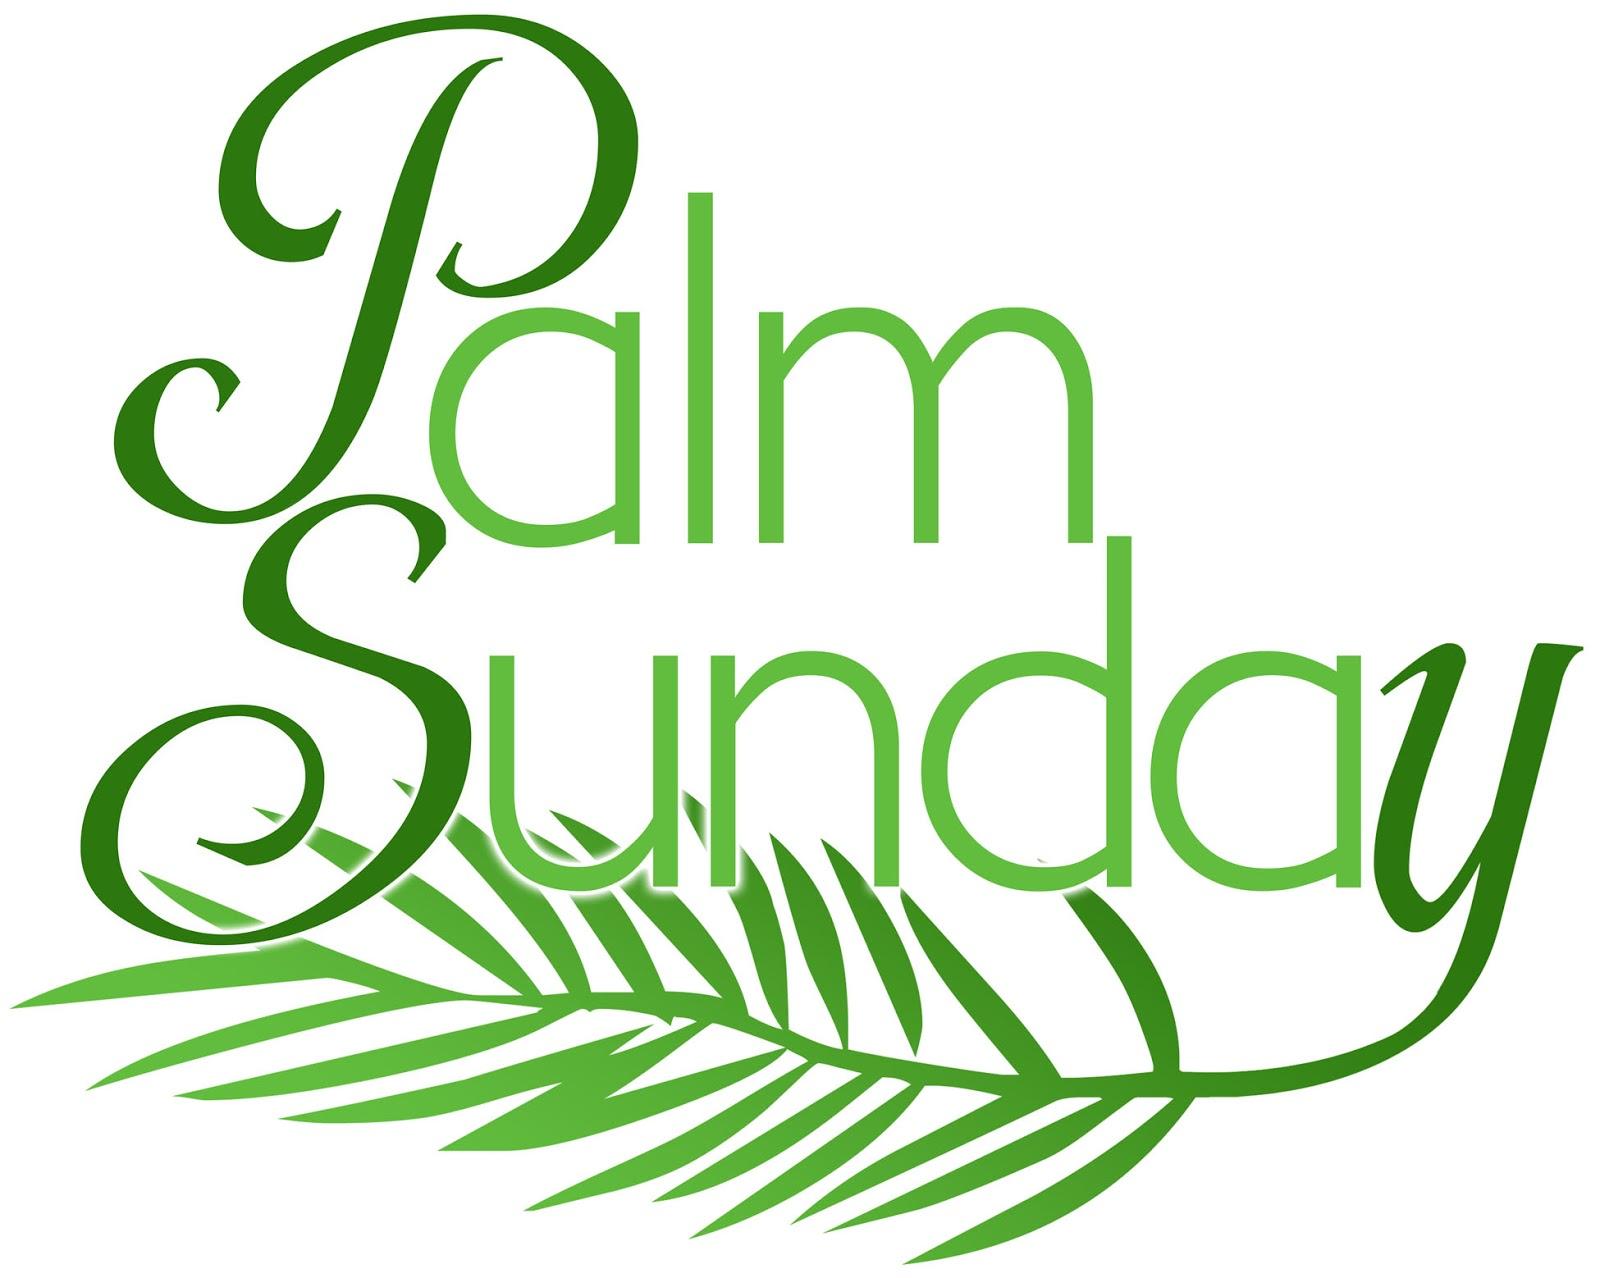 http://4.bp.blogspot.com/-rmEqg8LRYb8/UTcLlzgc4pI/AAAAAAAAJak/kSYuYy-sZlY/s1600/Palm_Sunday_Wallpaper_wishescelebration_jesus_christian-_leaf(www.picturespool.blogspot.com__06.jpg Christian